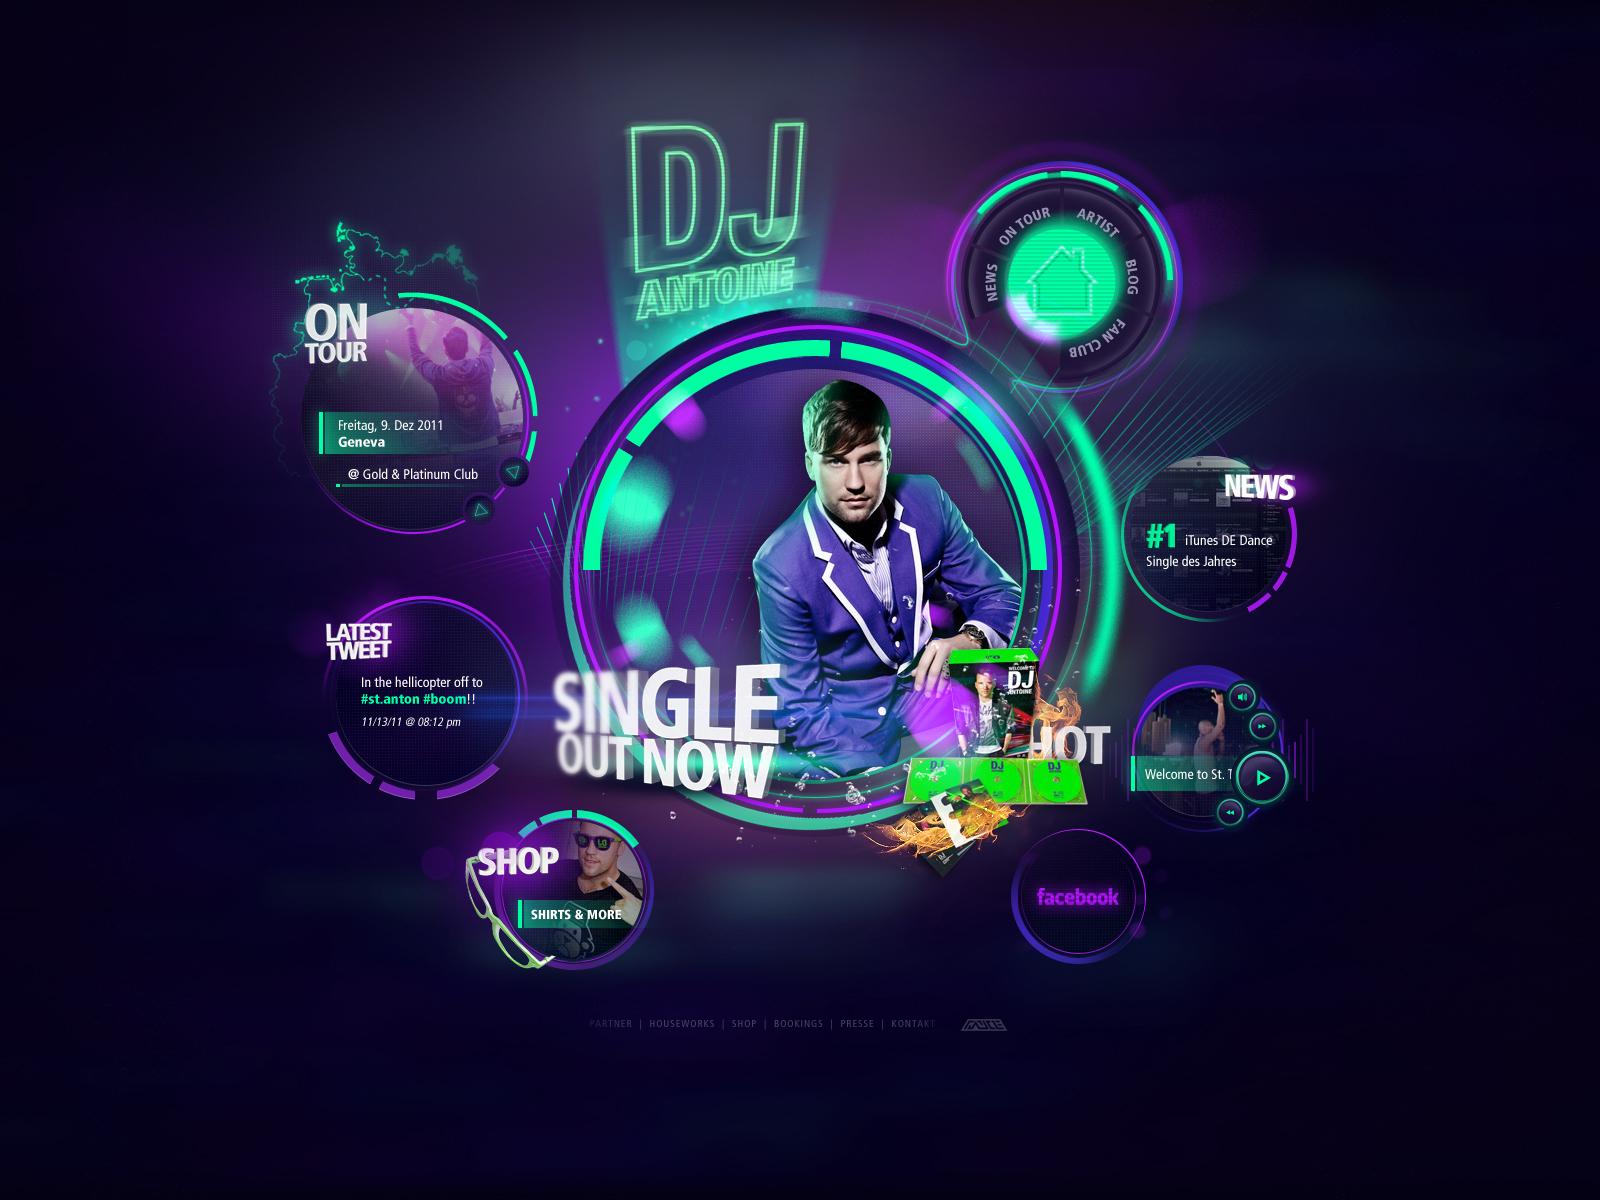 DJ Antoine Re-Design For Sale by Tropfich on DeviantArt